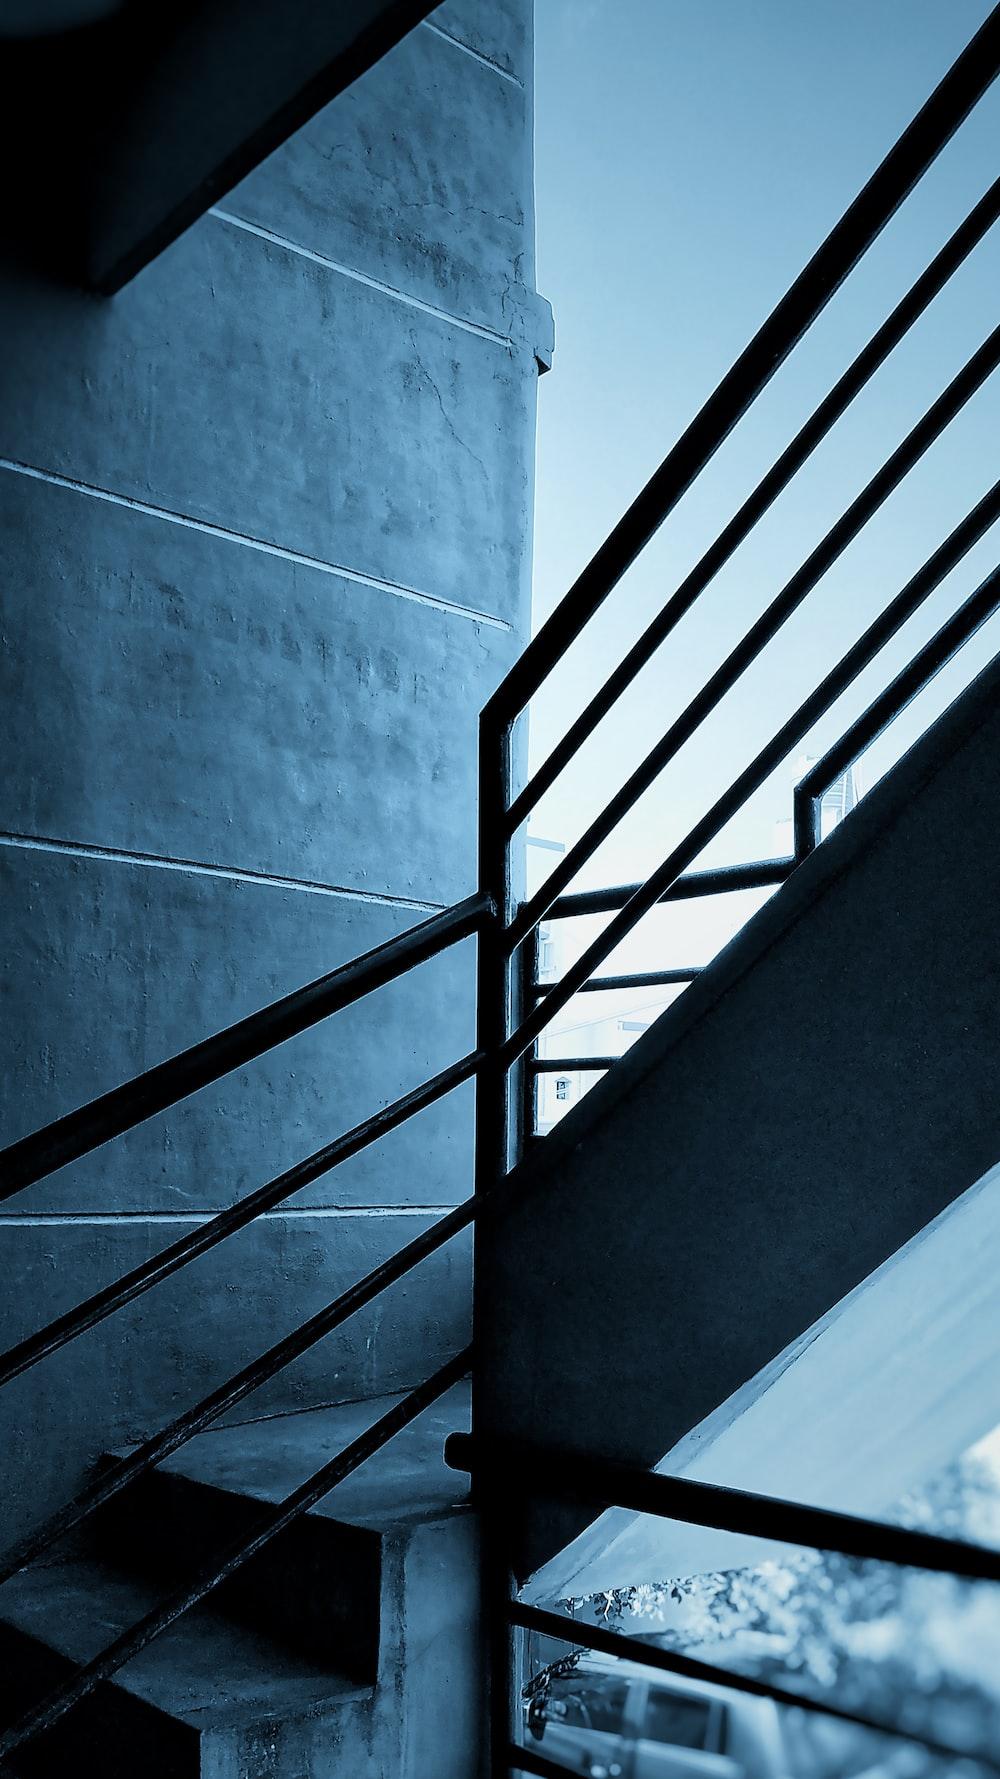 black metal staircase on gray concrete wall